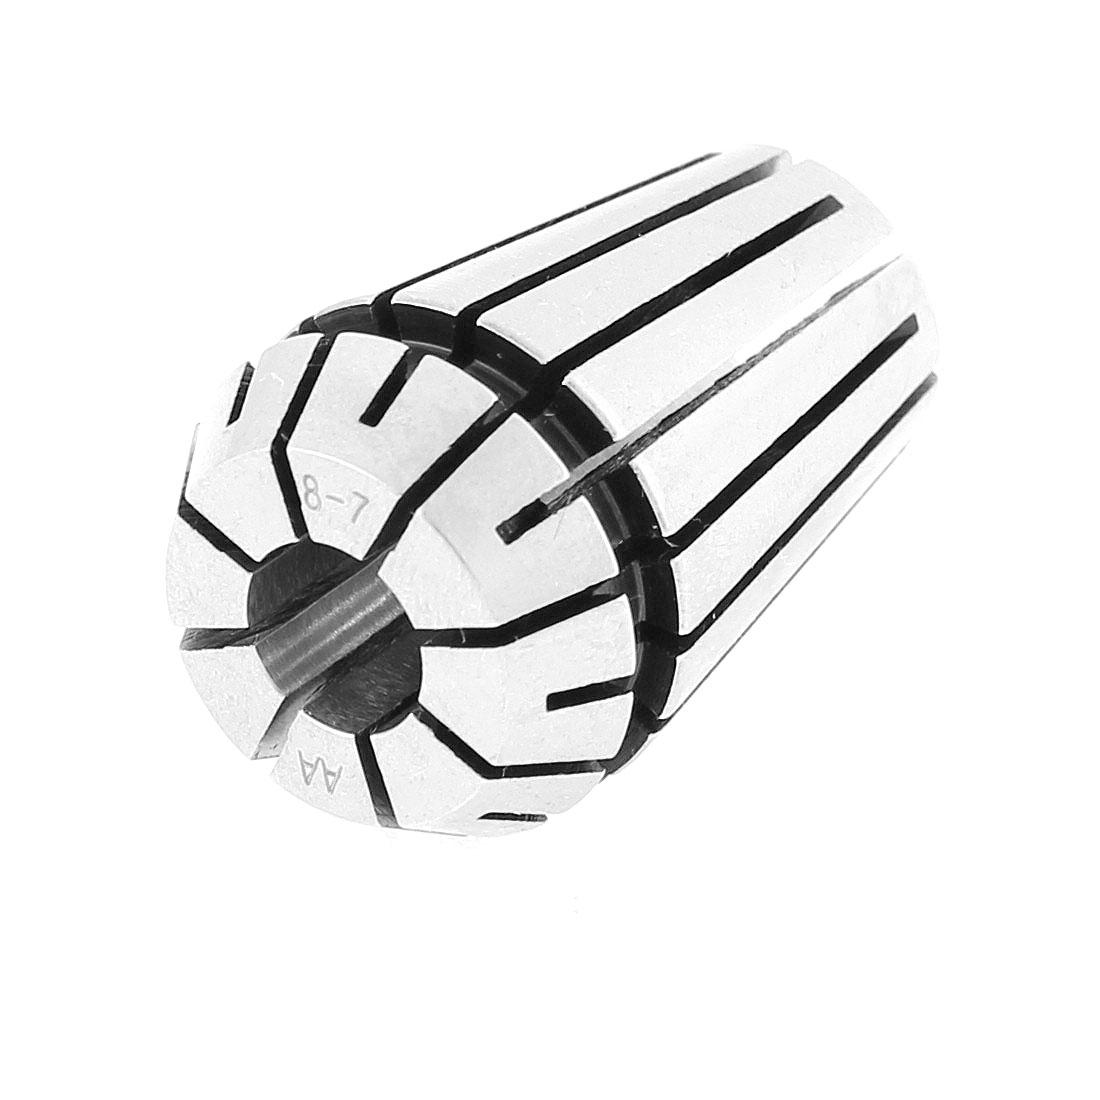 ER20 8mm Stainless Steel Spring Collet Holder CNC Milling Lathe Tool 8-7mm Clamp Range